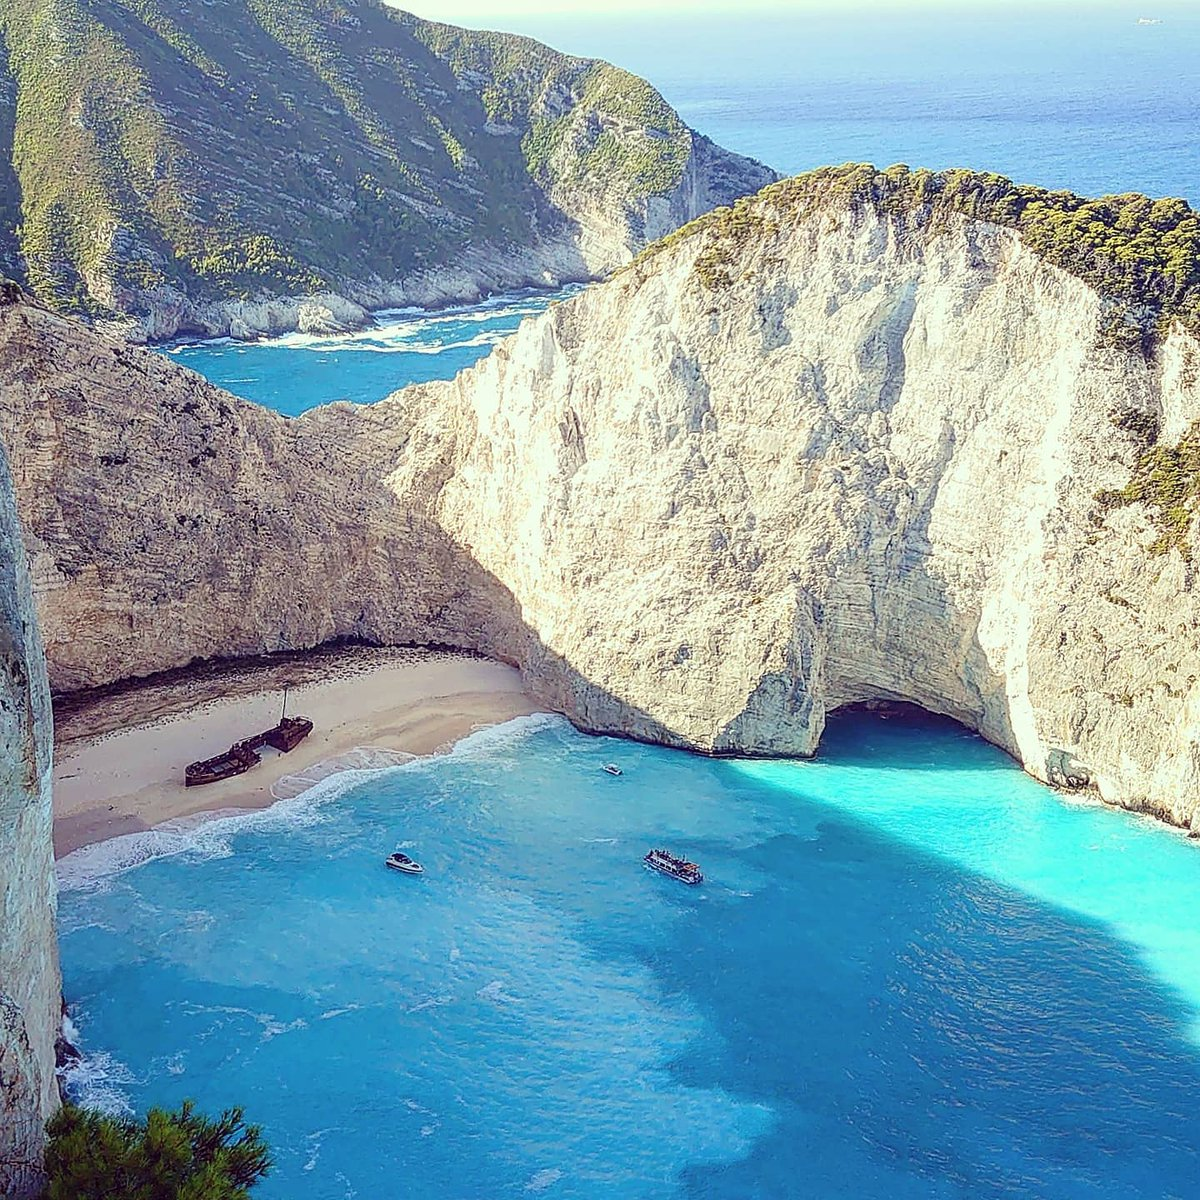 Take me back to #worldsbestbeach 🗺📍 #zante #zakynthos #greece 📸 #shipwreckbeach #navagio ♯ #shipwreck #beach #beachlife #blue #bluesea #cliffs #cove #ionianislands #sun #sea #sand #greekislands #travel #adventure  👀 @VisitGreecegr 🇬🇷 @Zakynthosgreece 🏖️ @jet2tweets ✈️